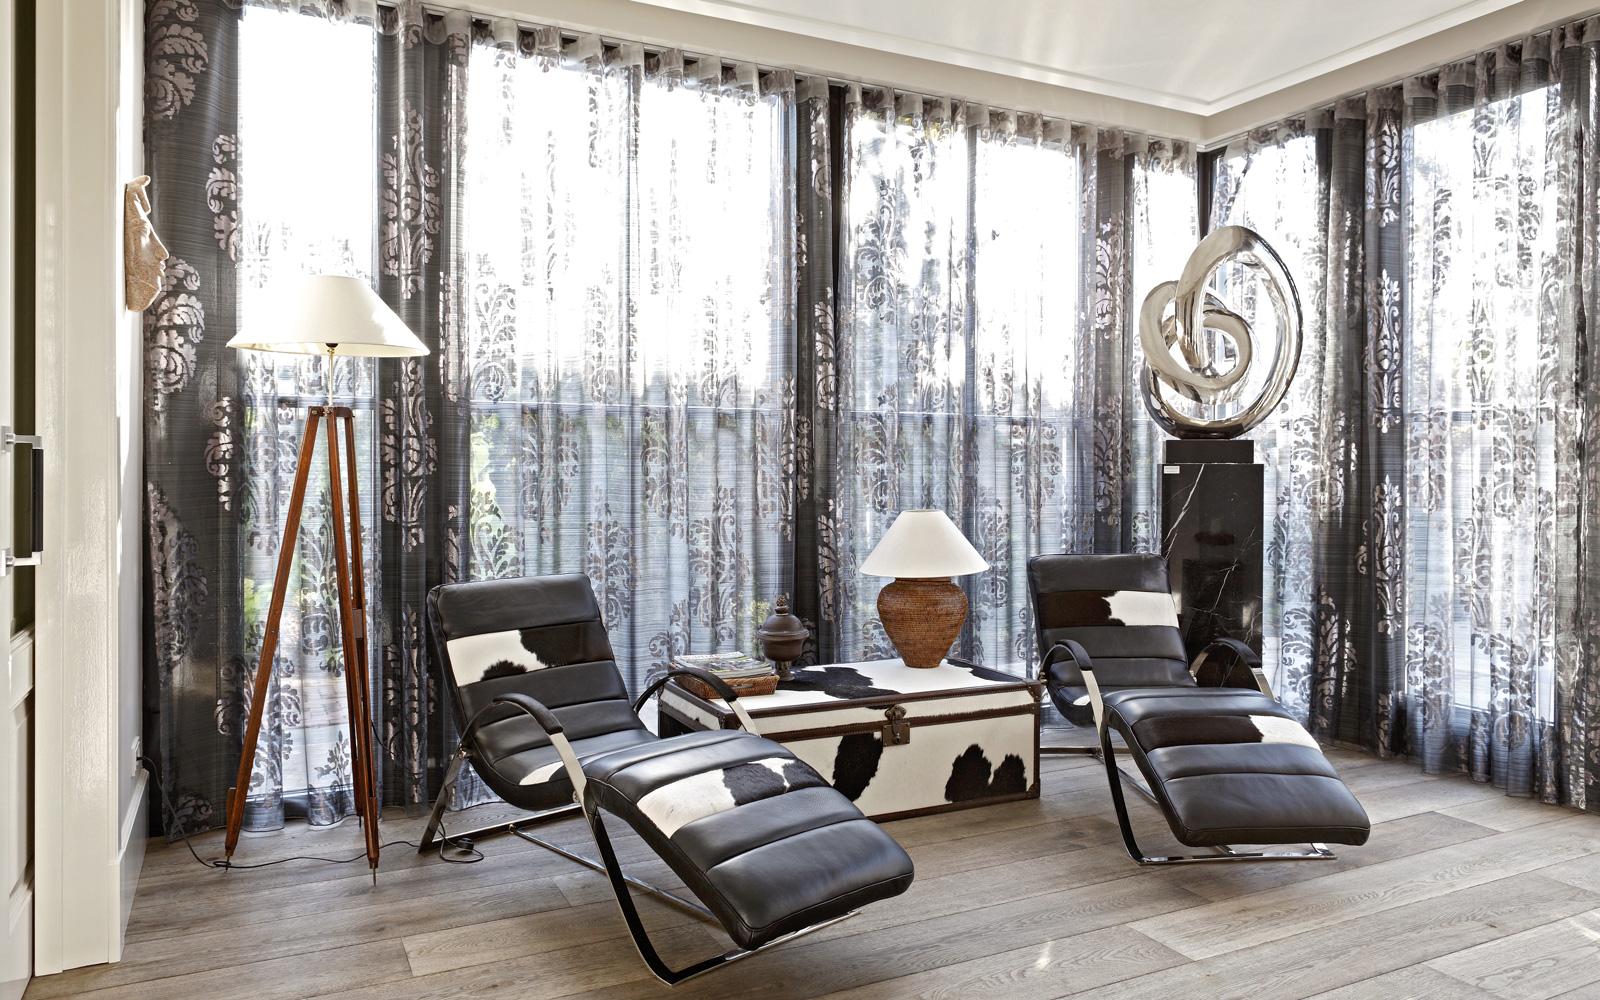 Lounge chair, stoelen, ontspannen, vitrage, koeienhuid, houten vloer, parket, Franse villa, Hertroijs Architekten